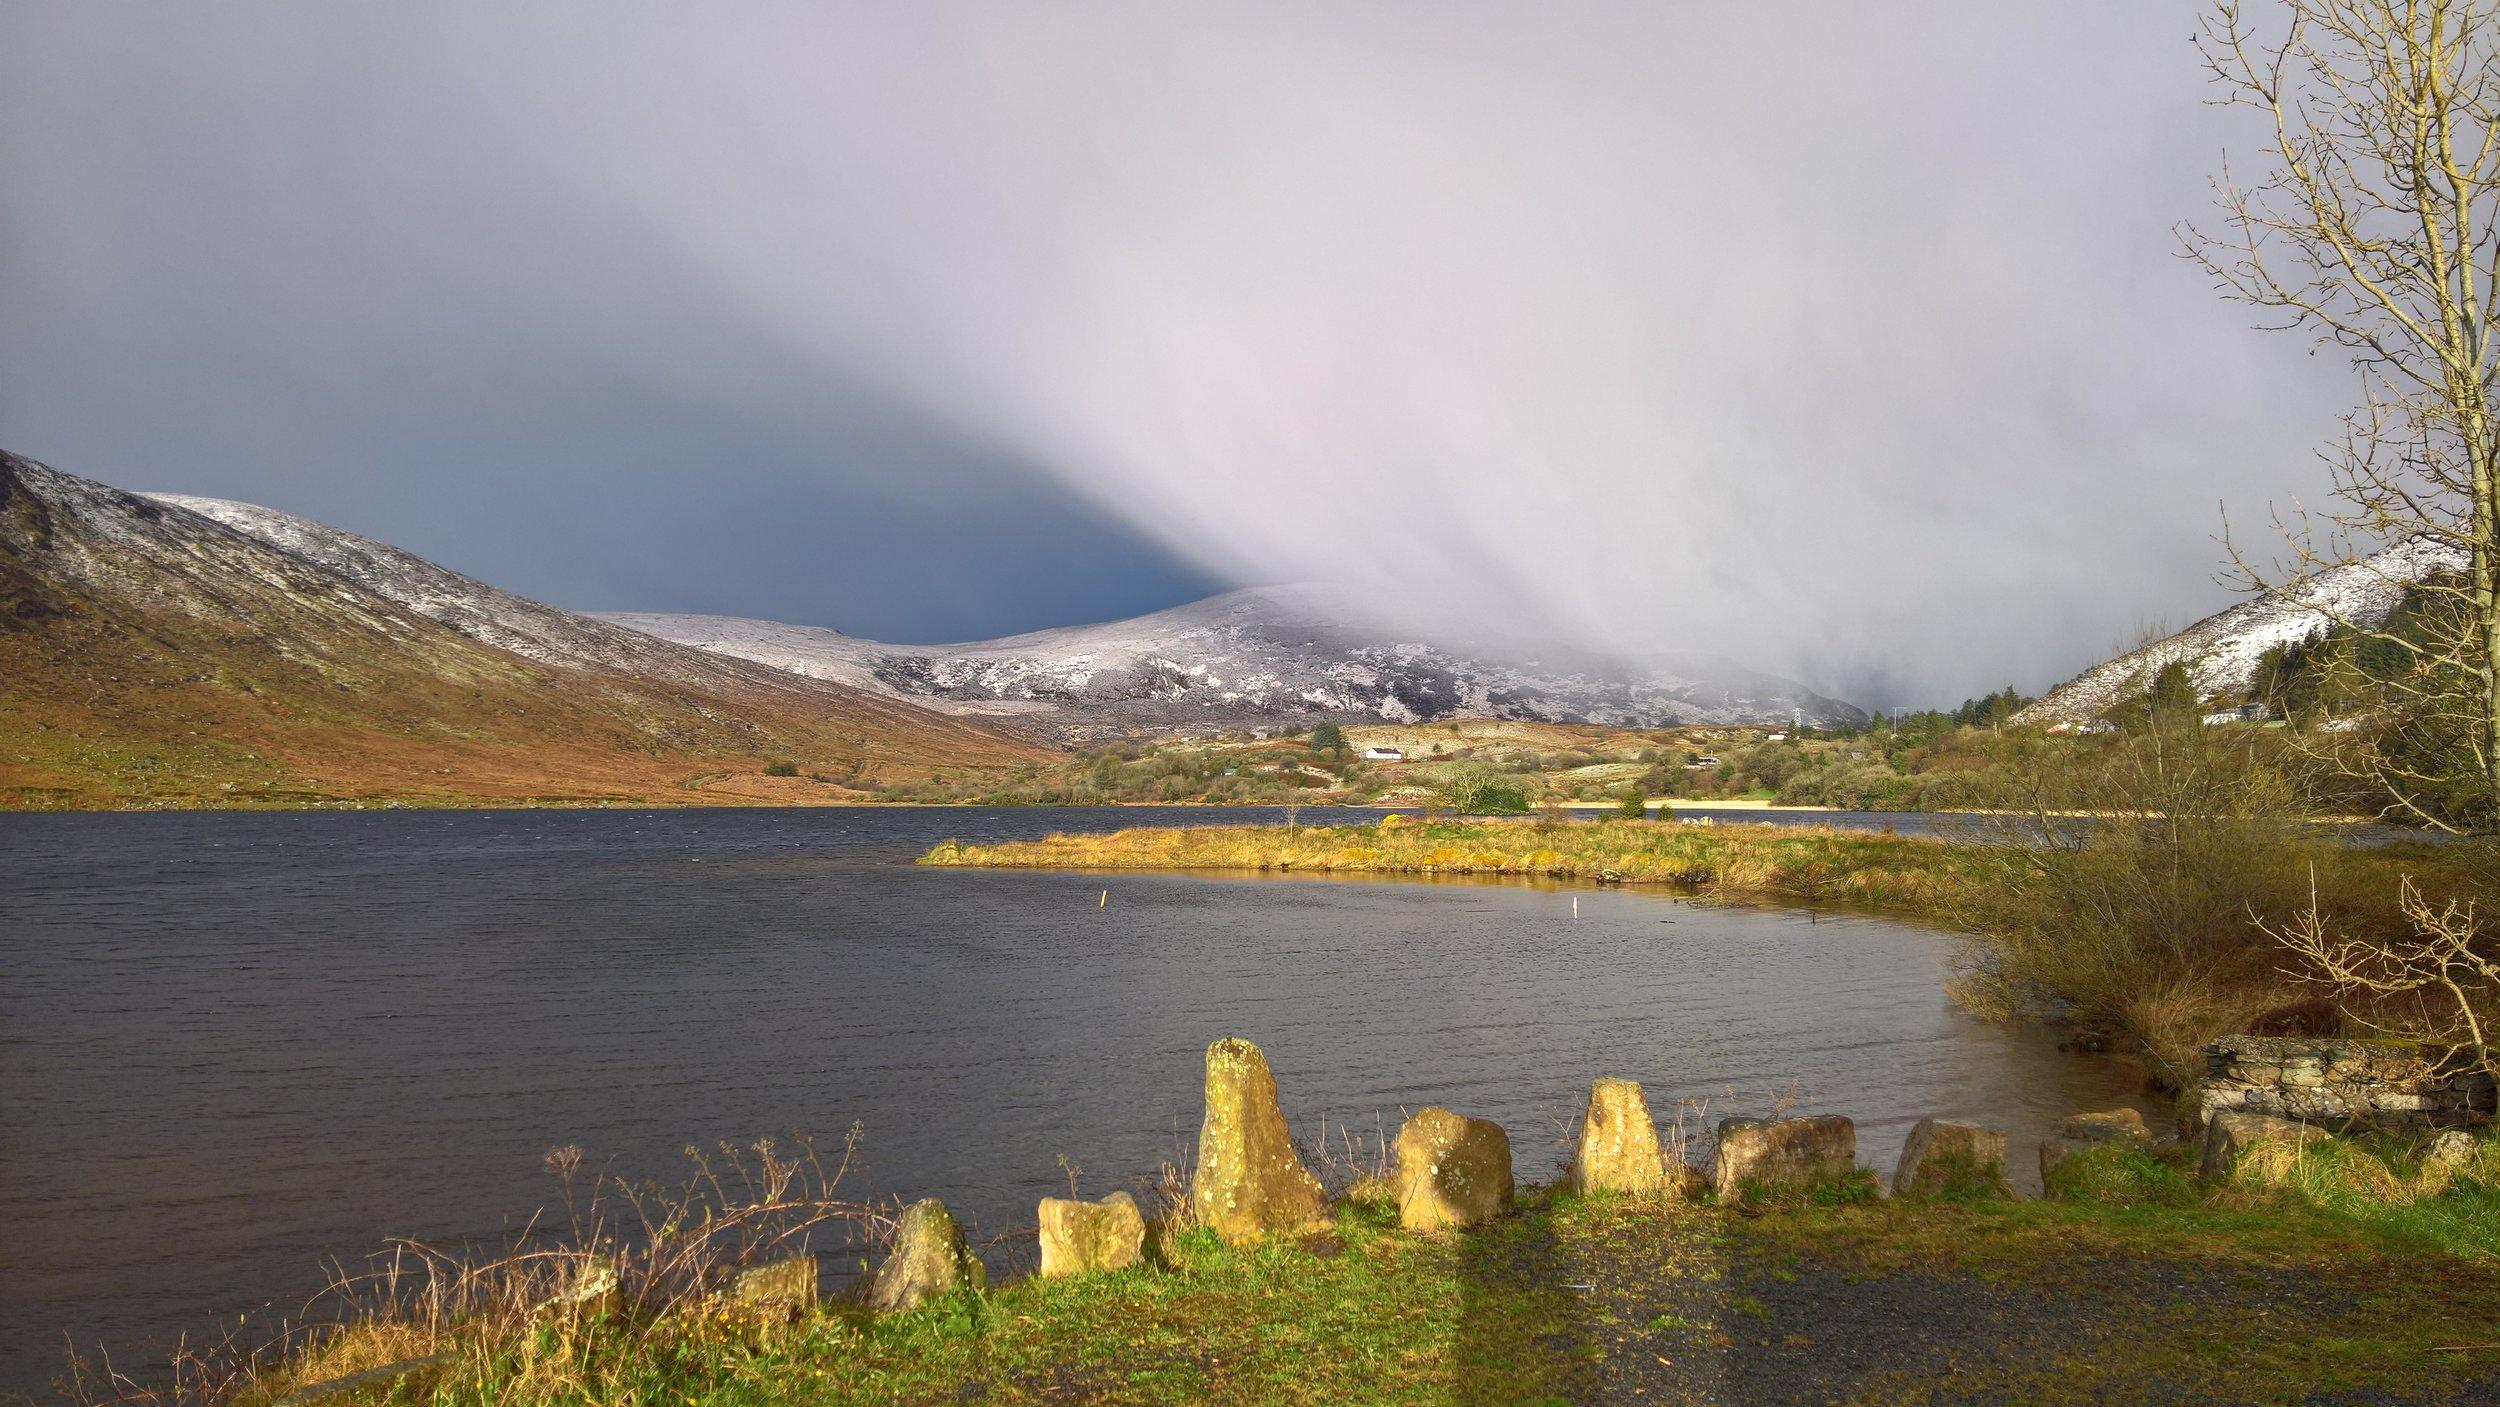 Lough Talt.